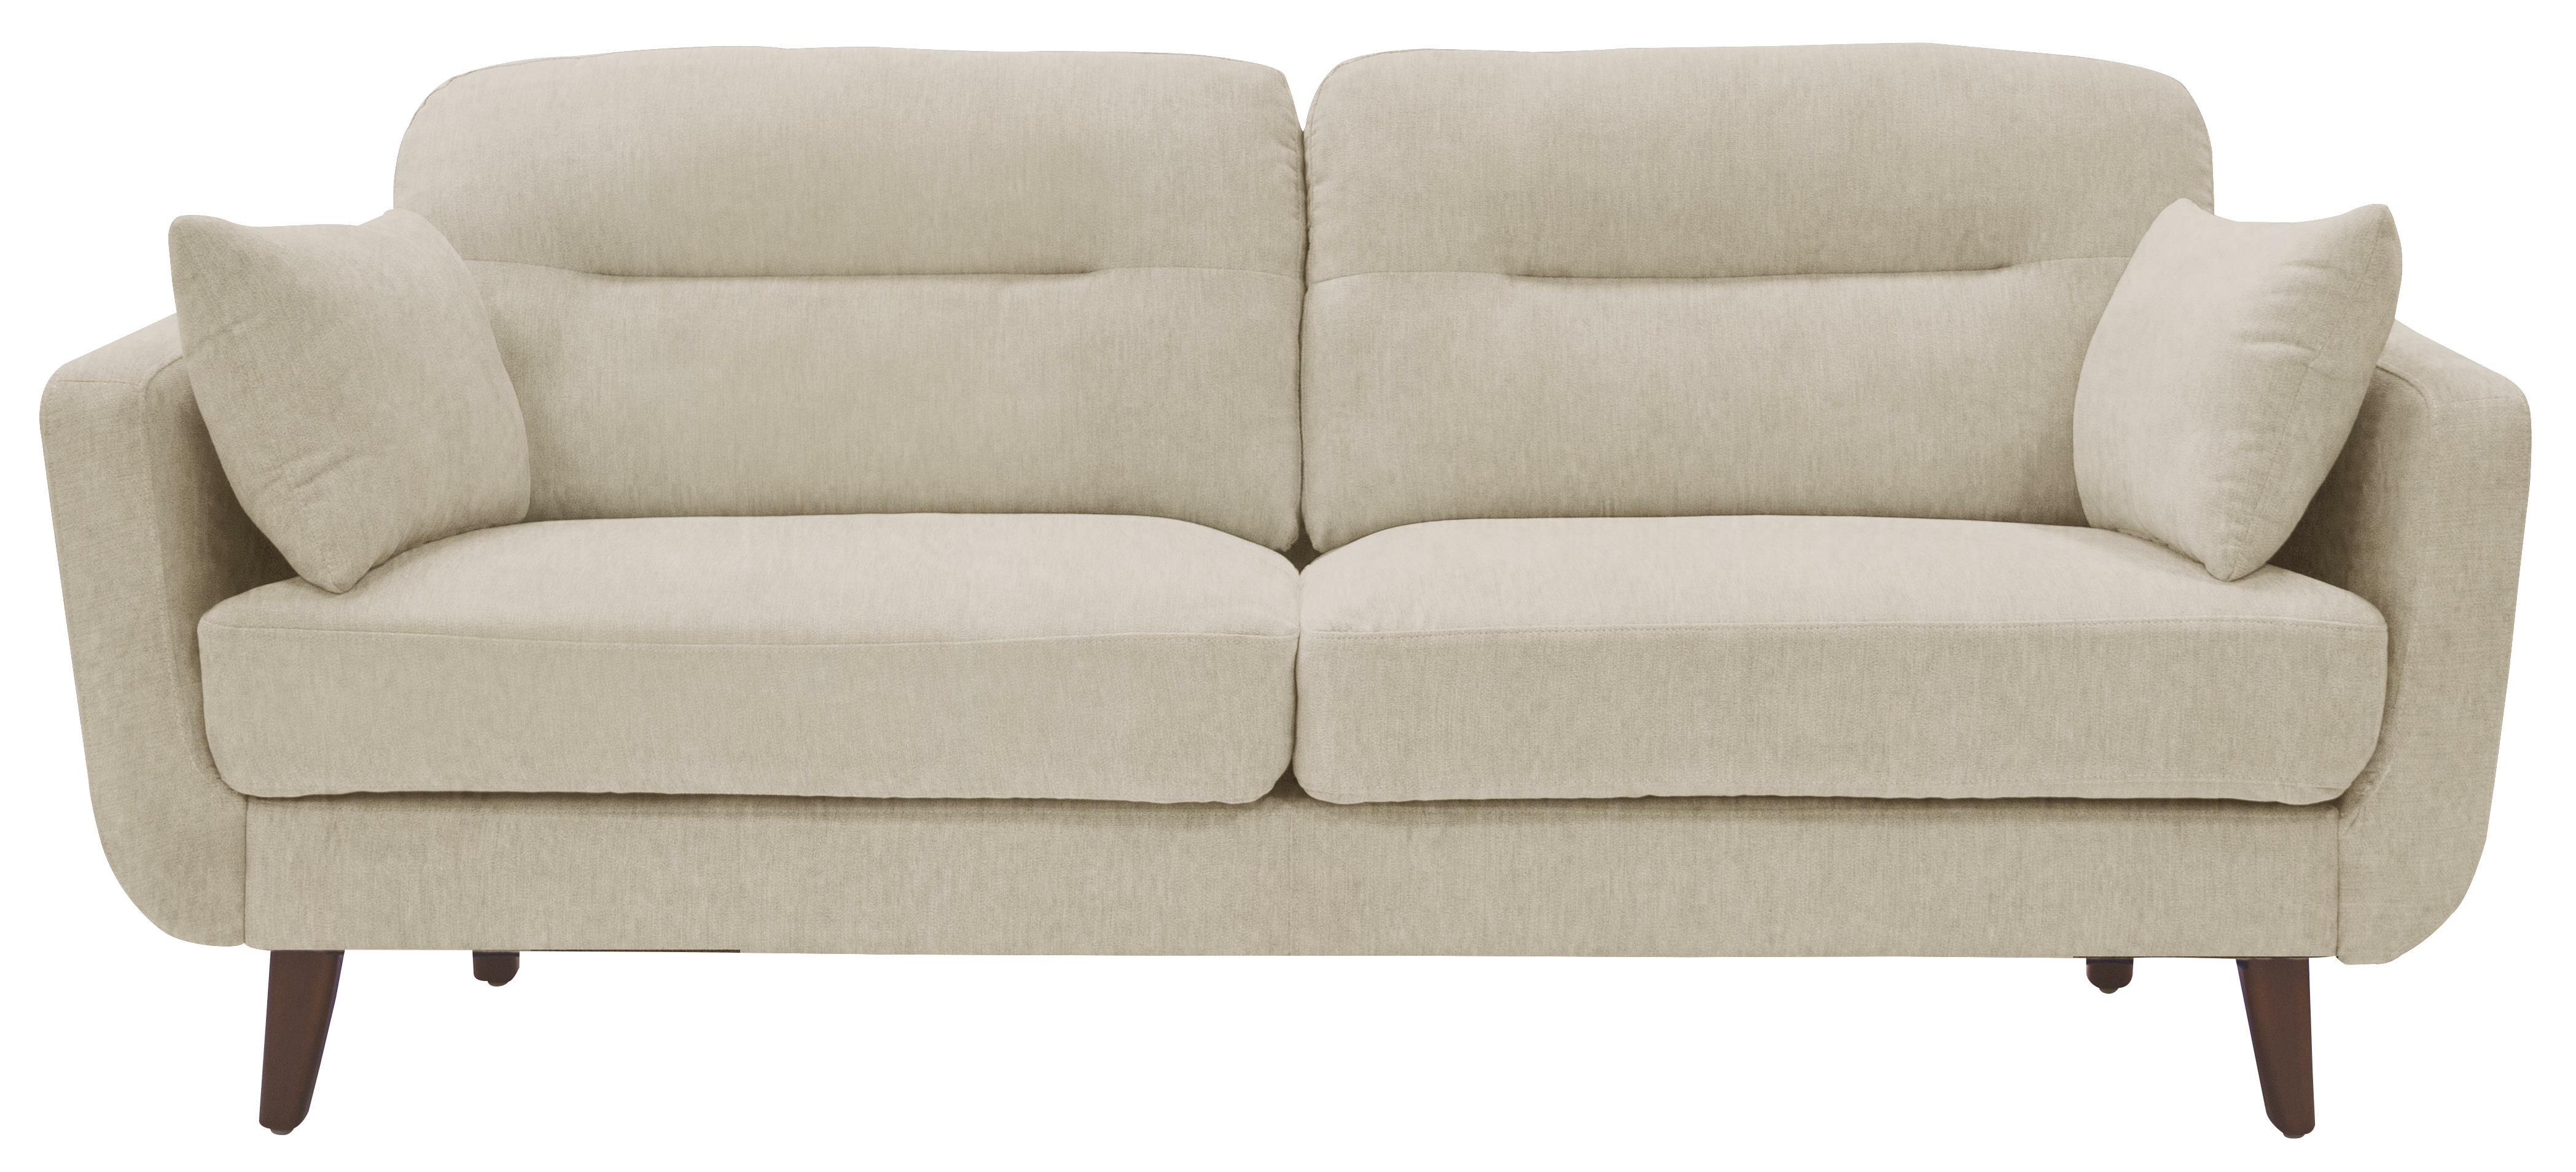 Chloe Mid Century Modern Sofa Reviews